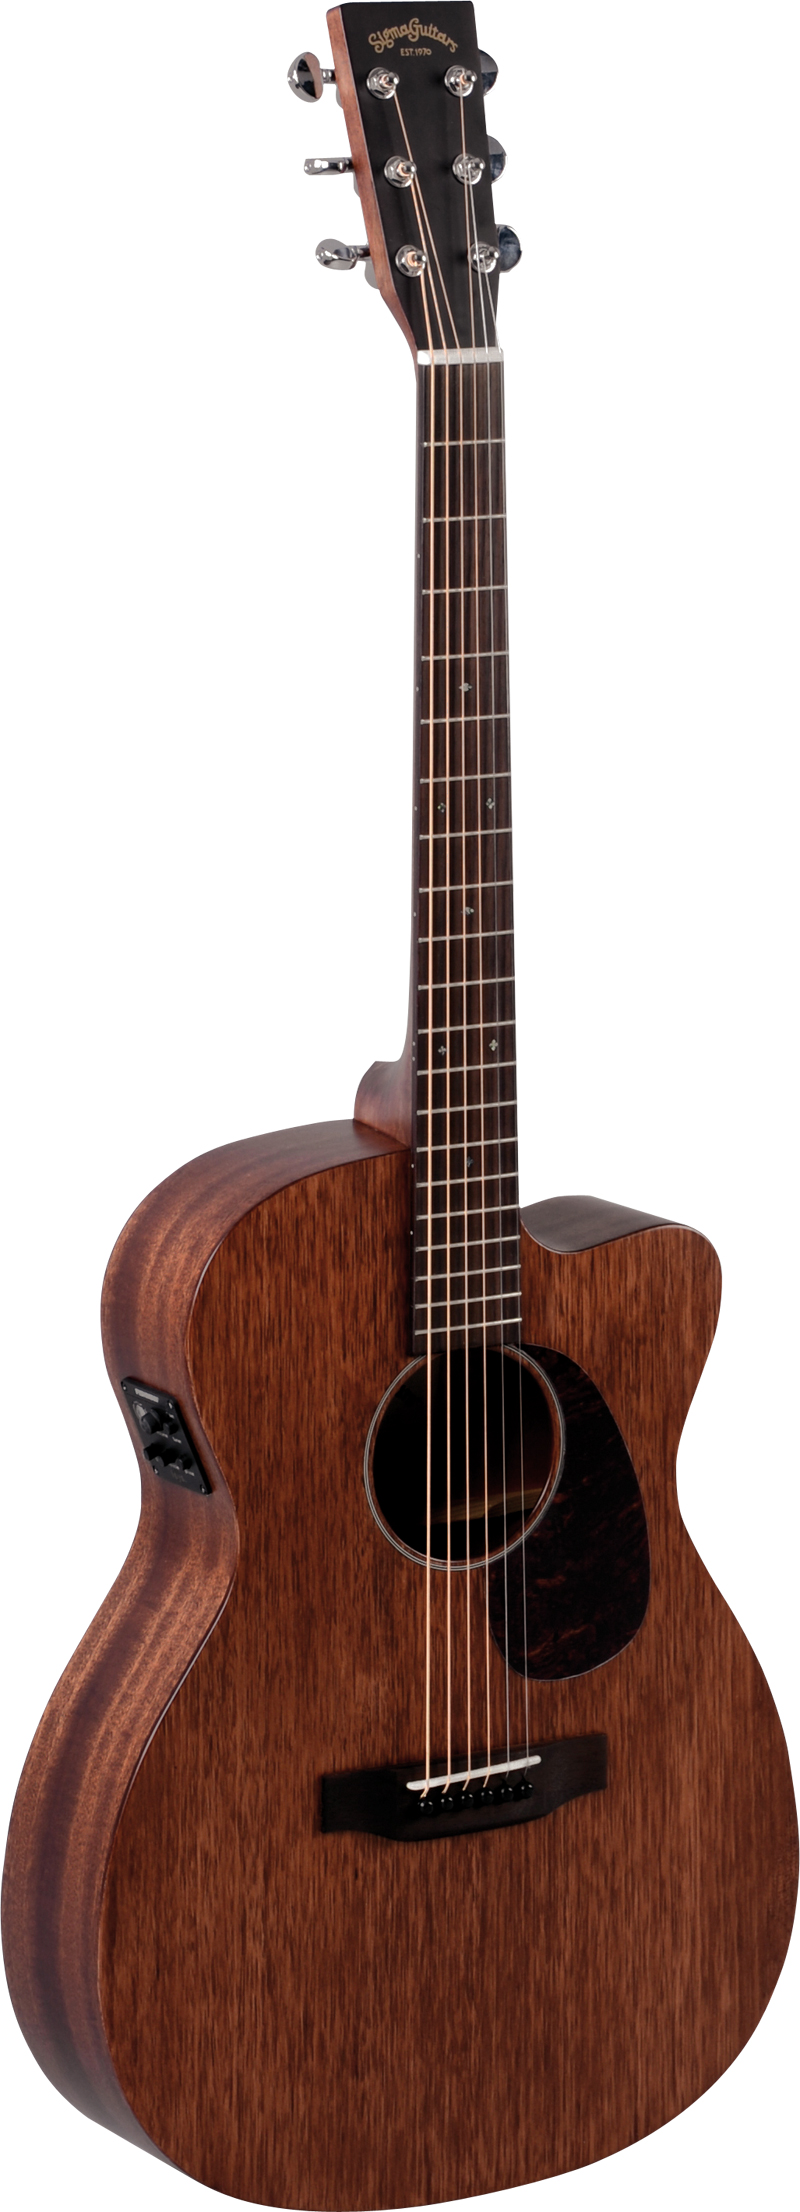 Billede af Sigma 000MC-15E western-guitar mahogni